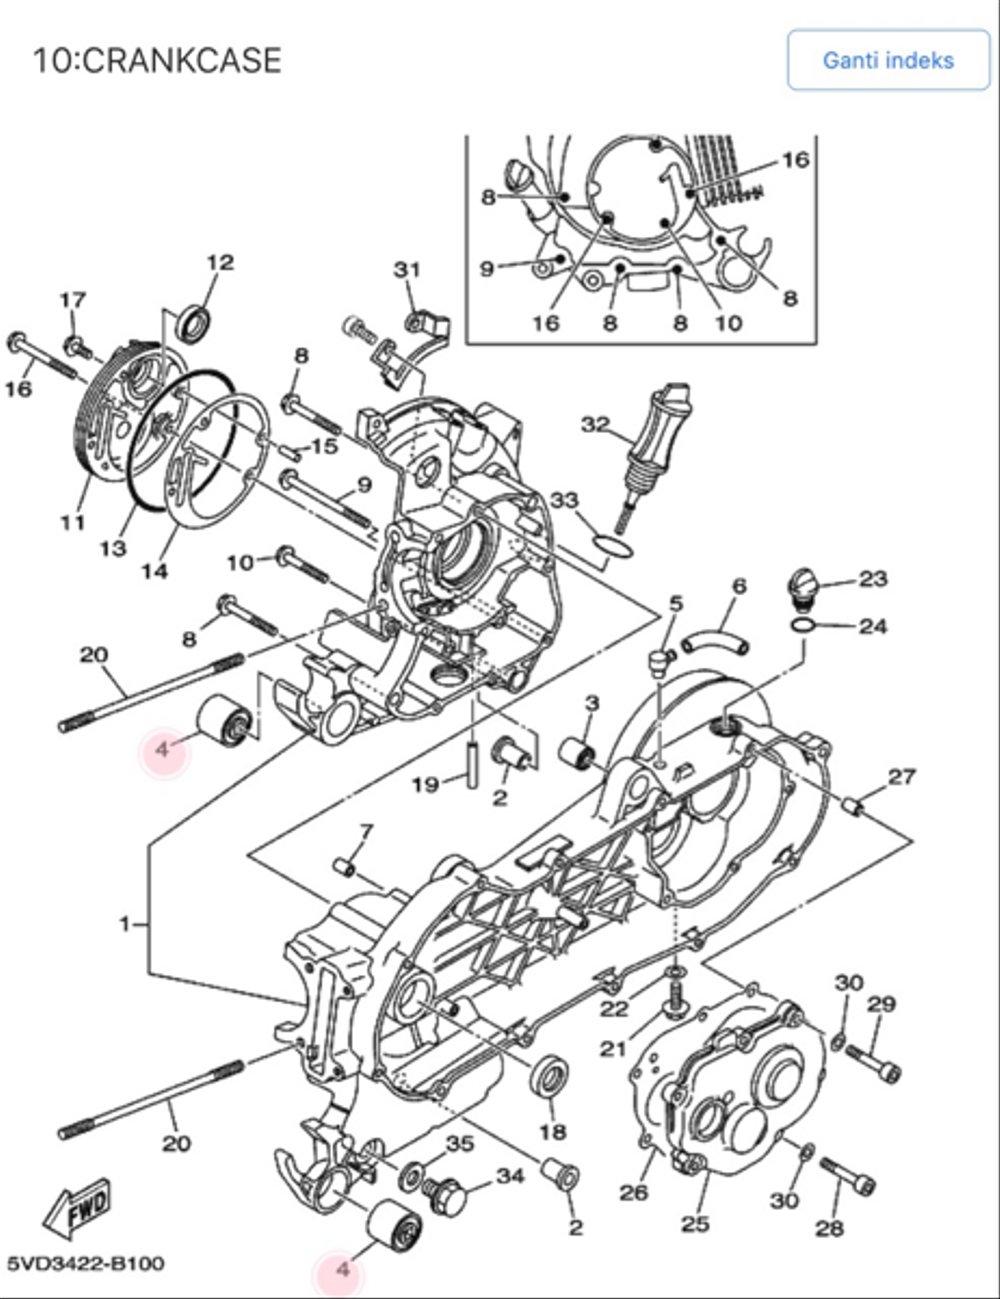 medium resolution of jual bagus engine mounting bos cvt nouvo asli yamaha di lapak diagram cvt nouvo